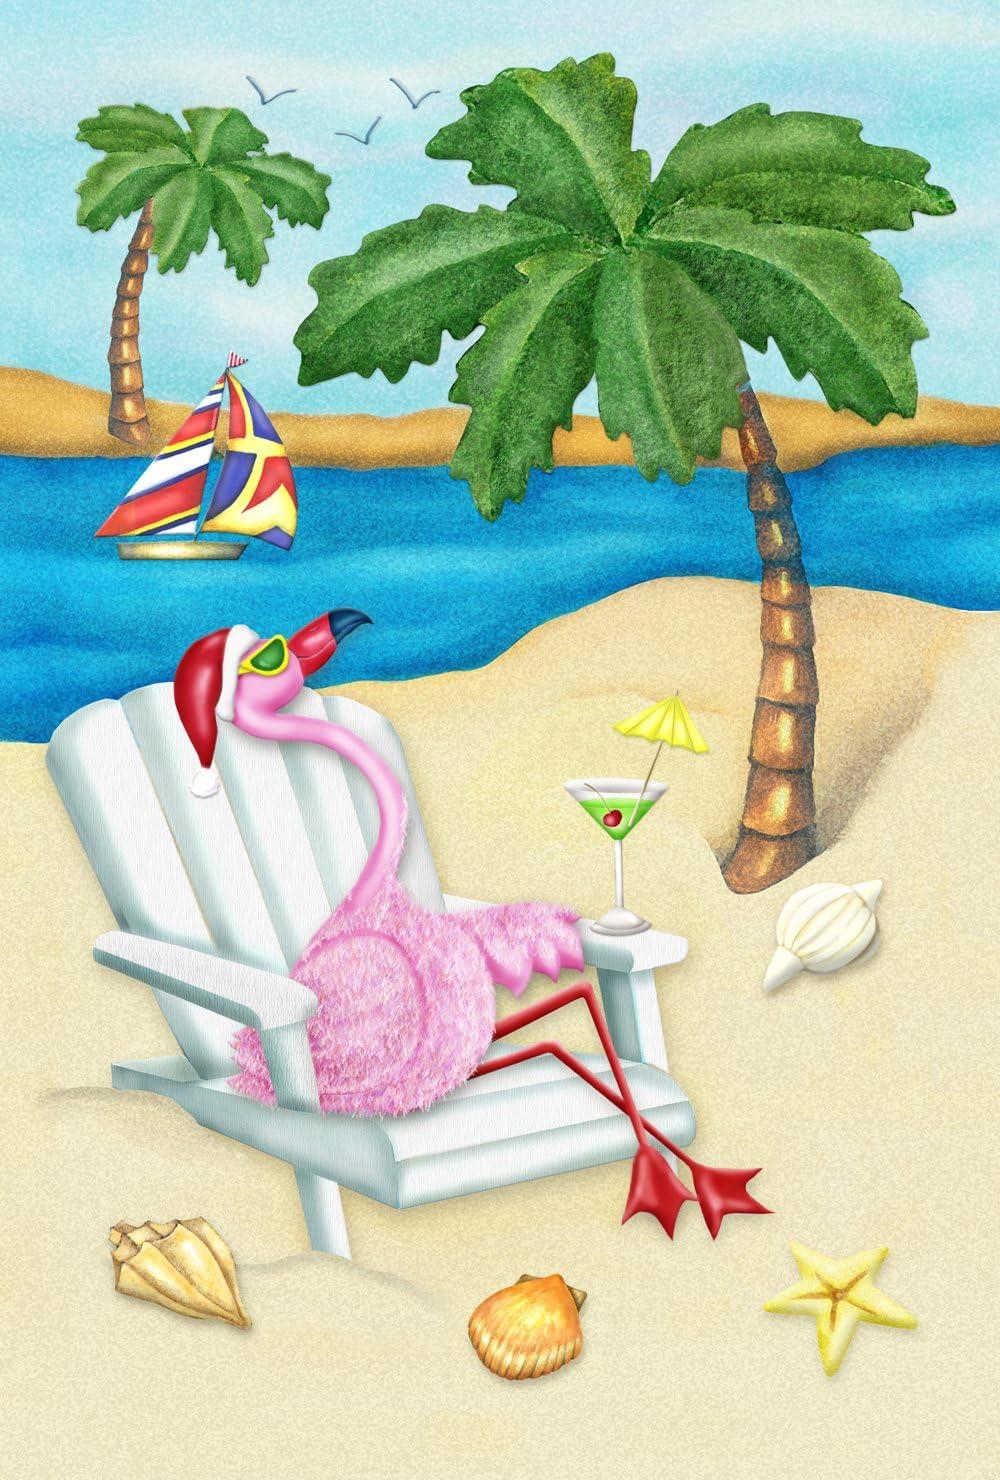 Toland Home Garden Sandy Christmas 28 x 40 Inch Decorative Tropical Beach Holiday Flamingo House Flag